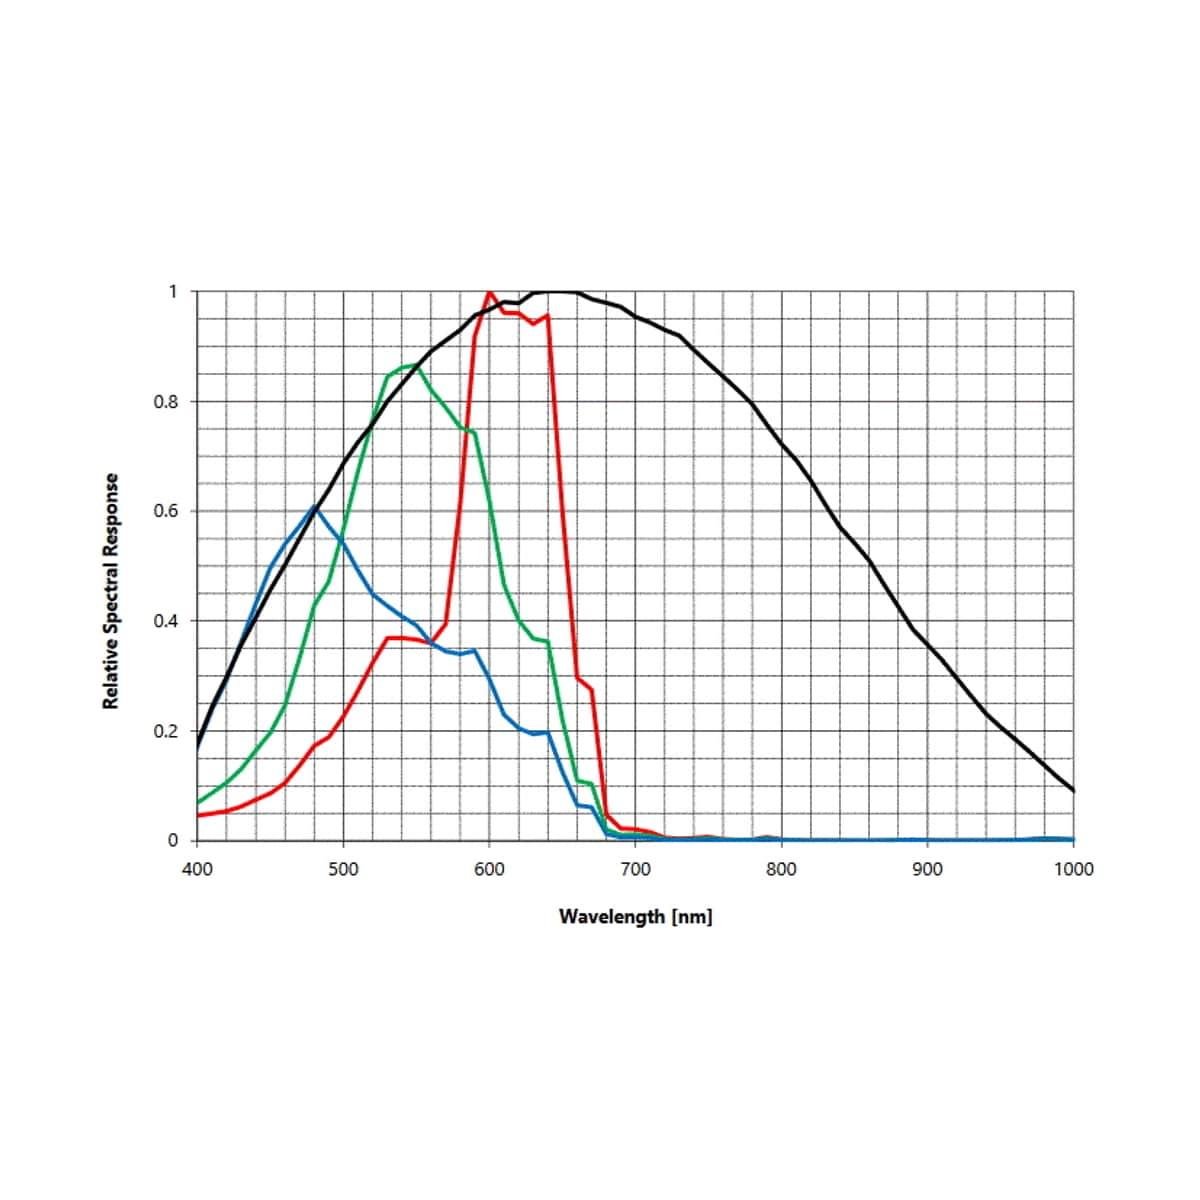 Photron FASTCAM NOVA S-Serie - Spektralkurve